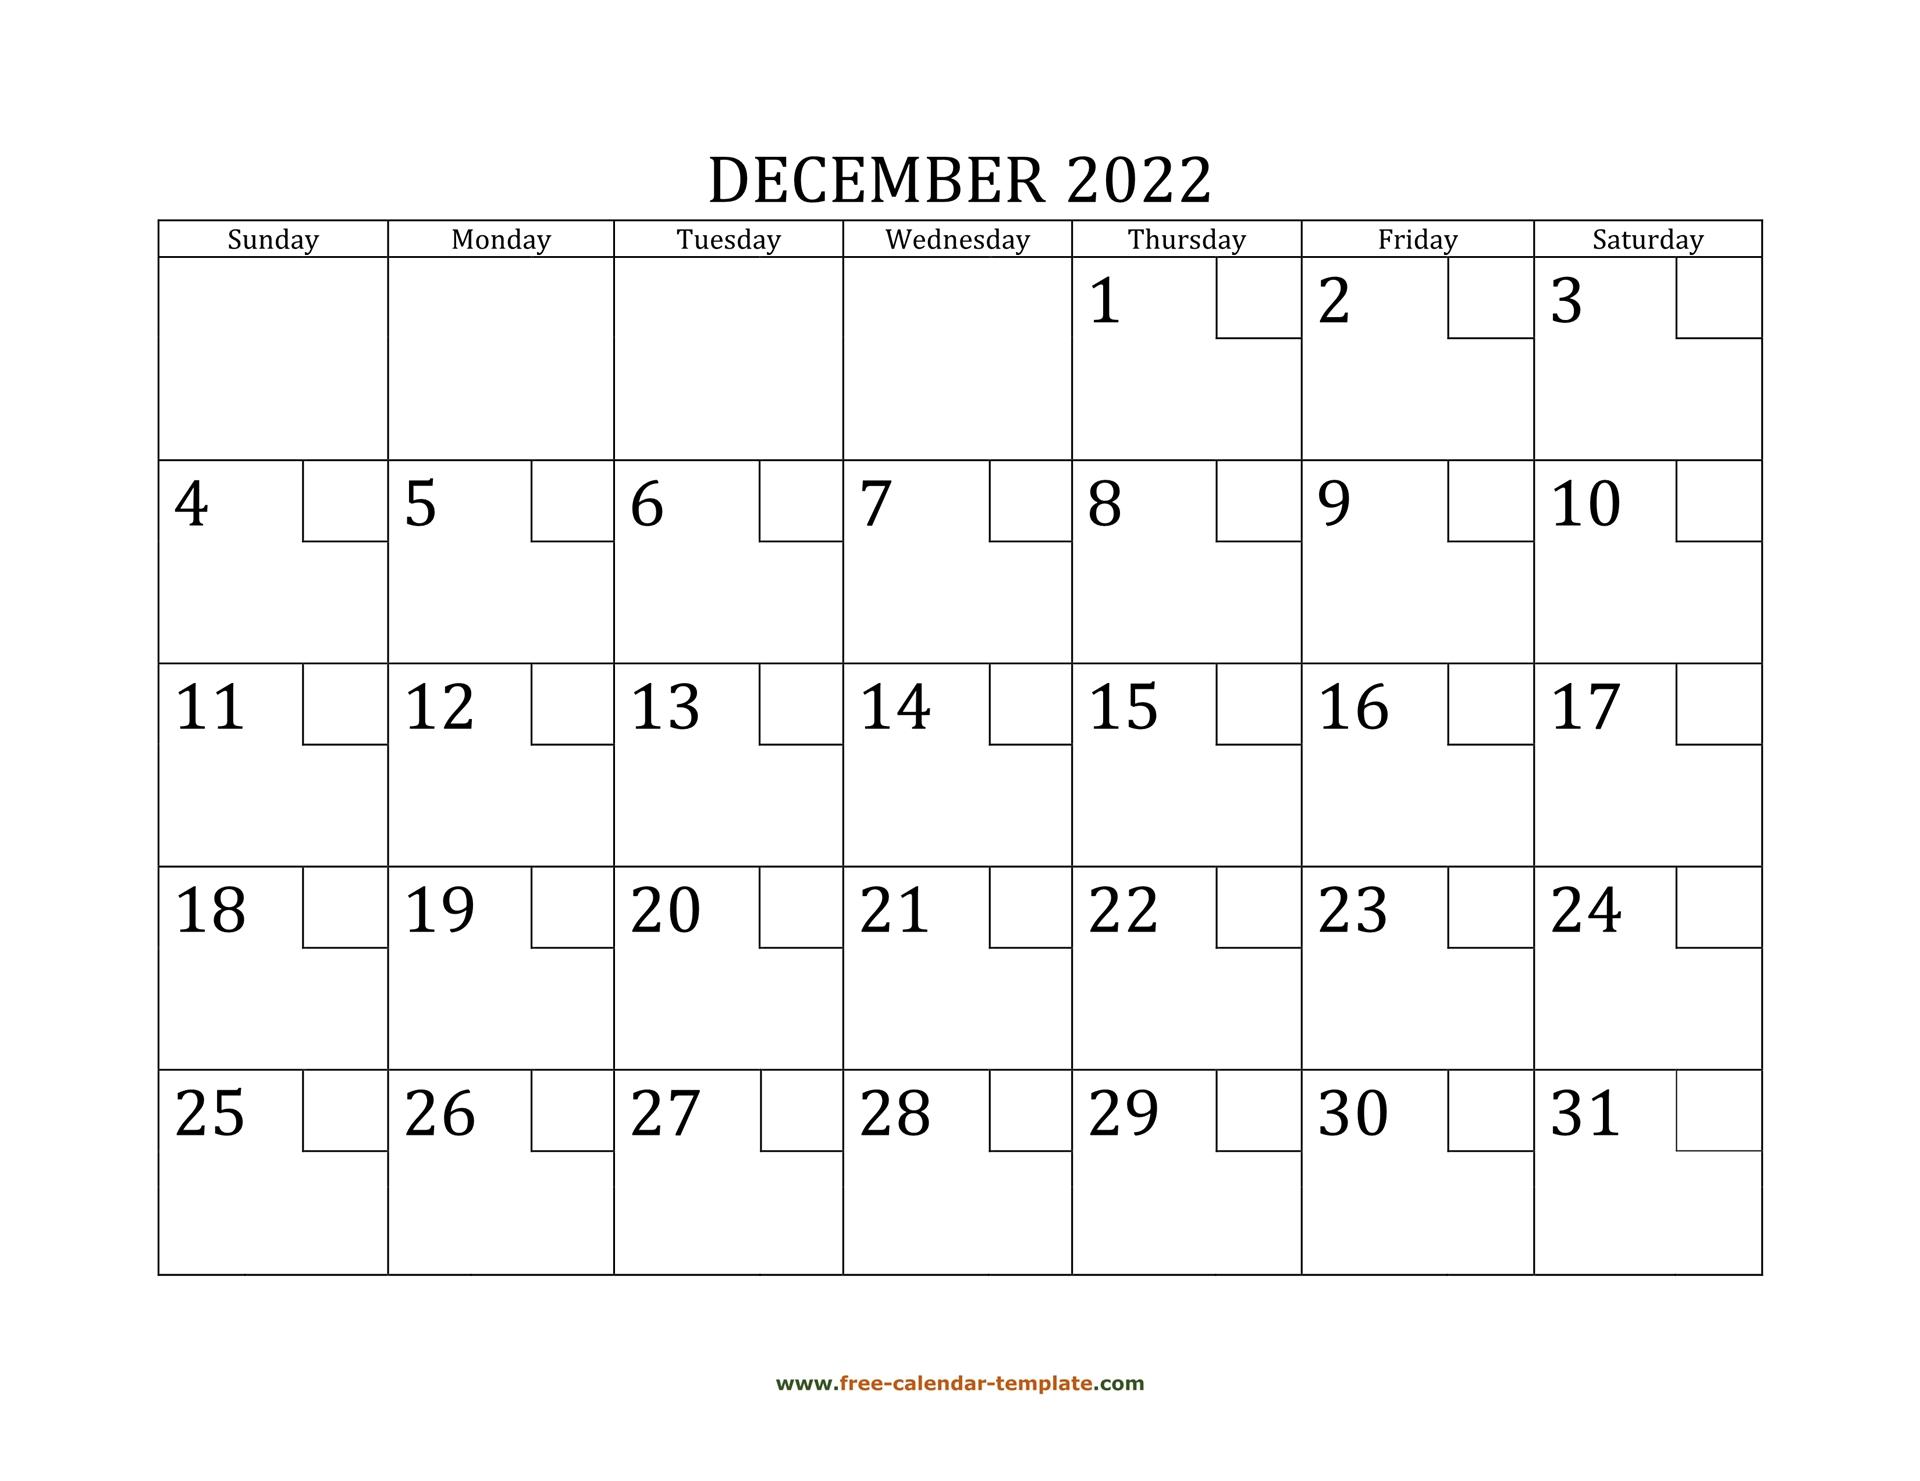 December Calendar 2022 Printable With Checkboxes